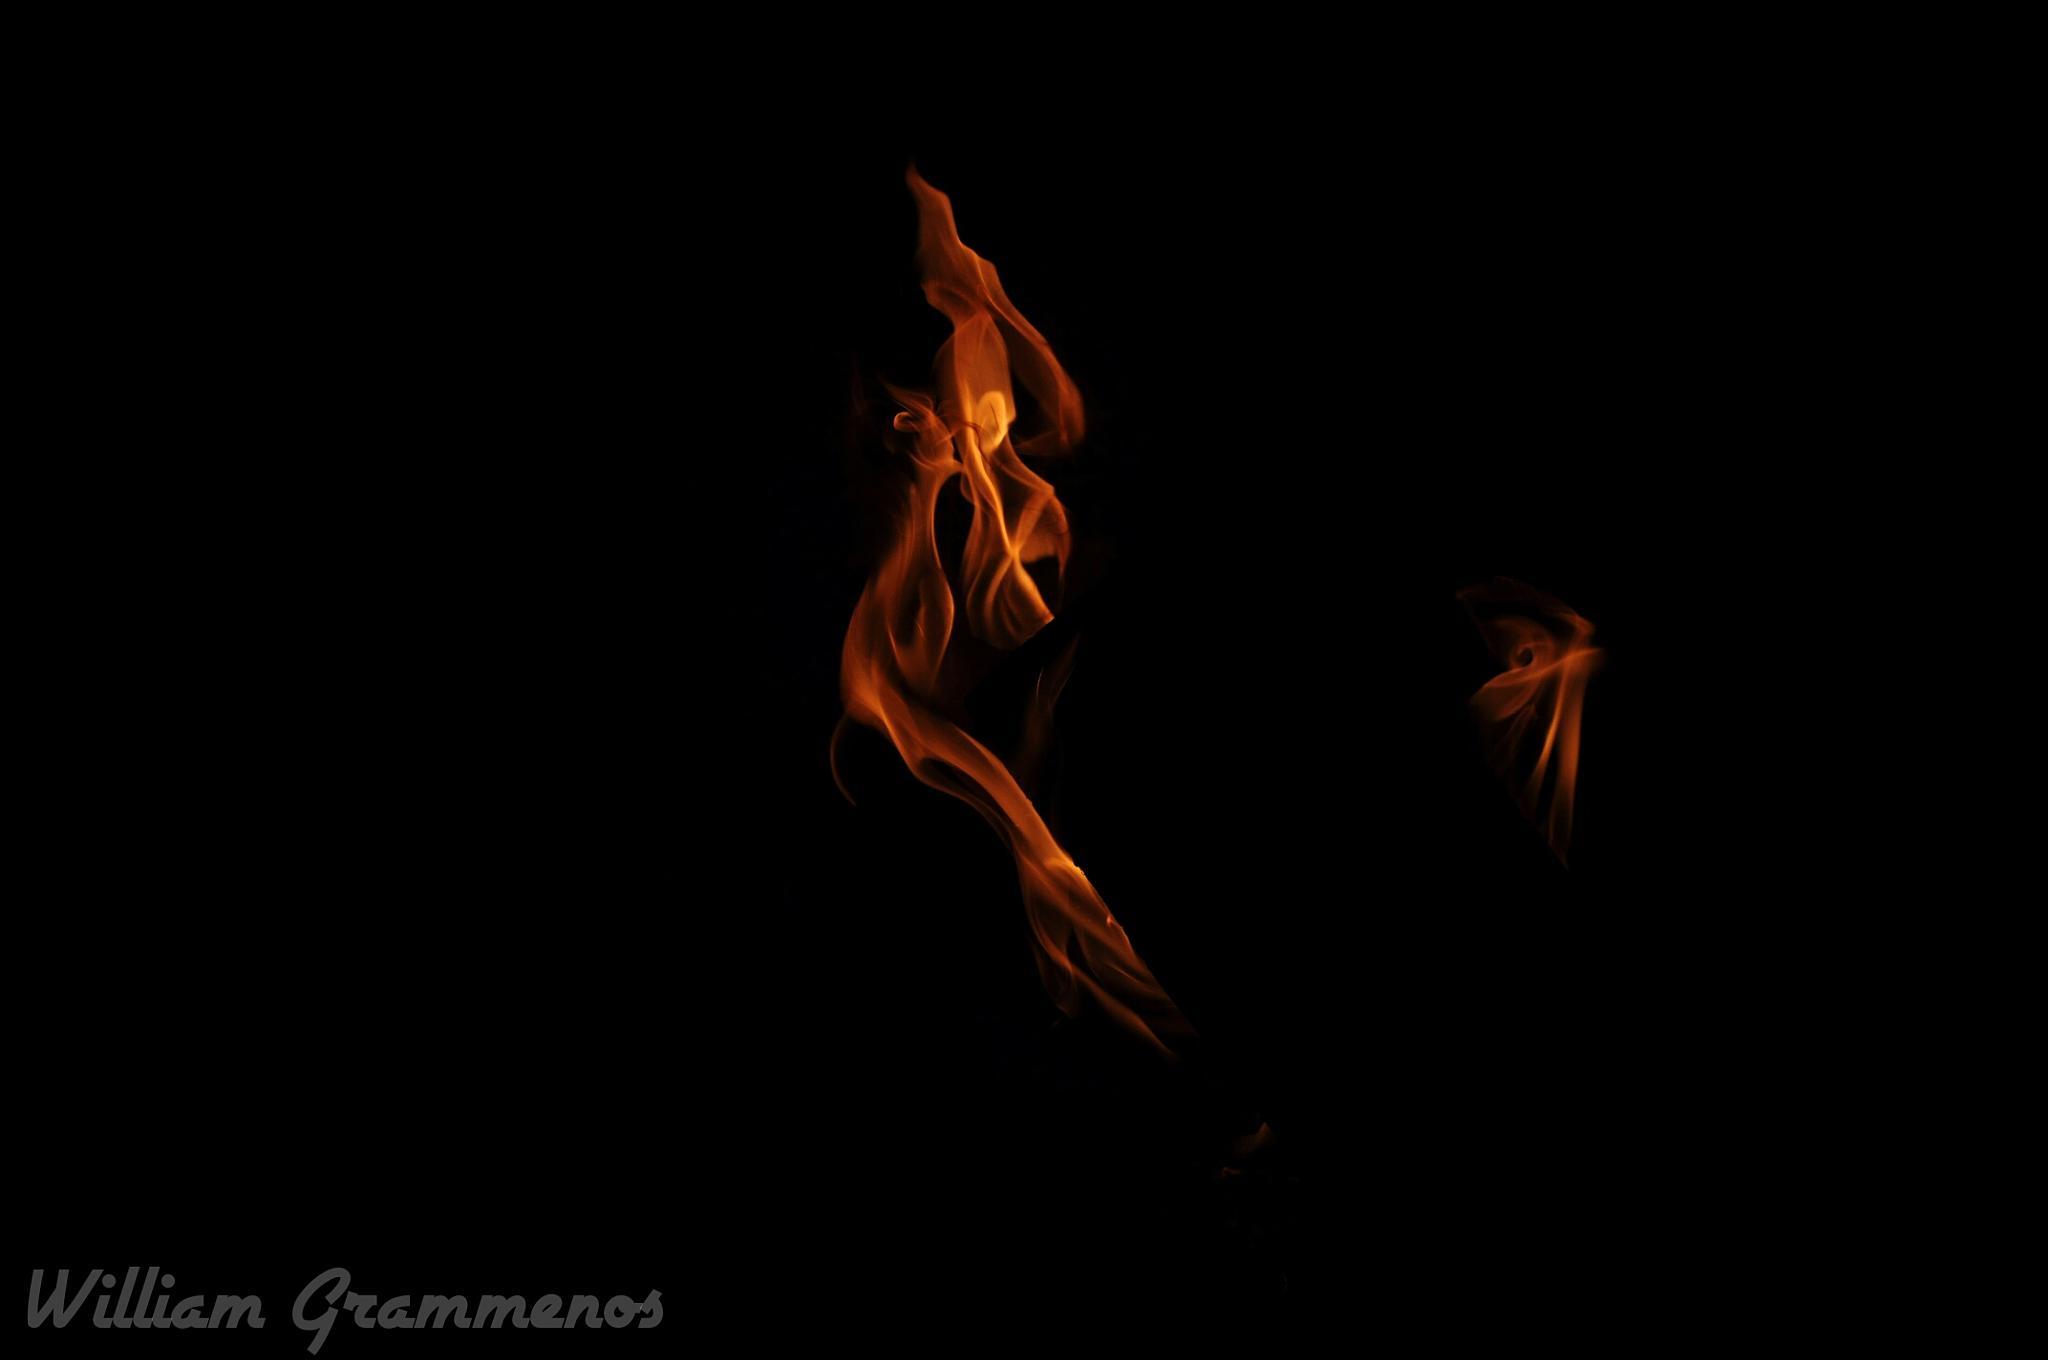 Dancing Fire by William Grammenos